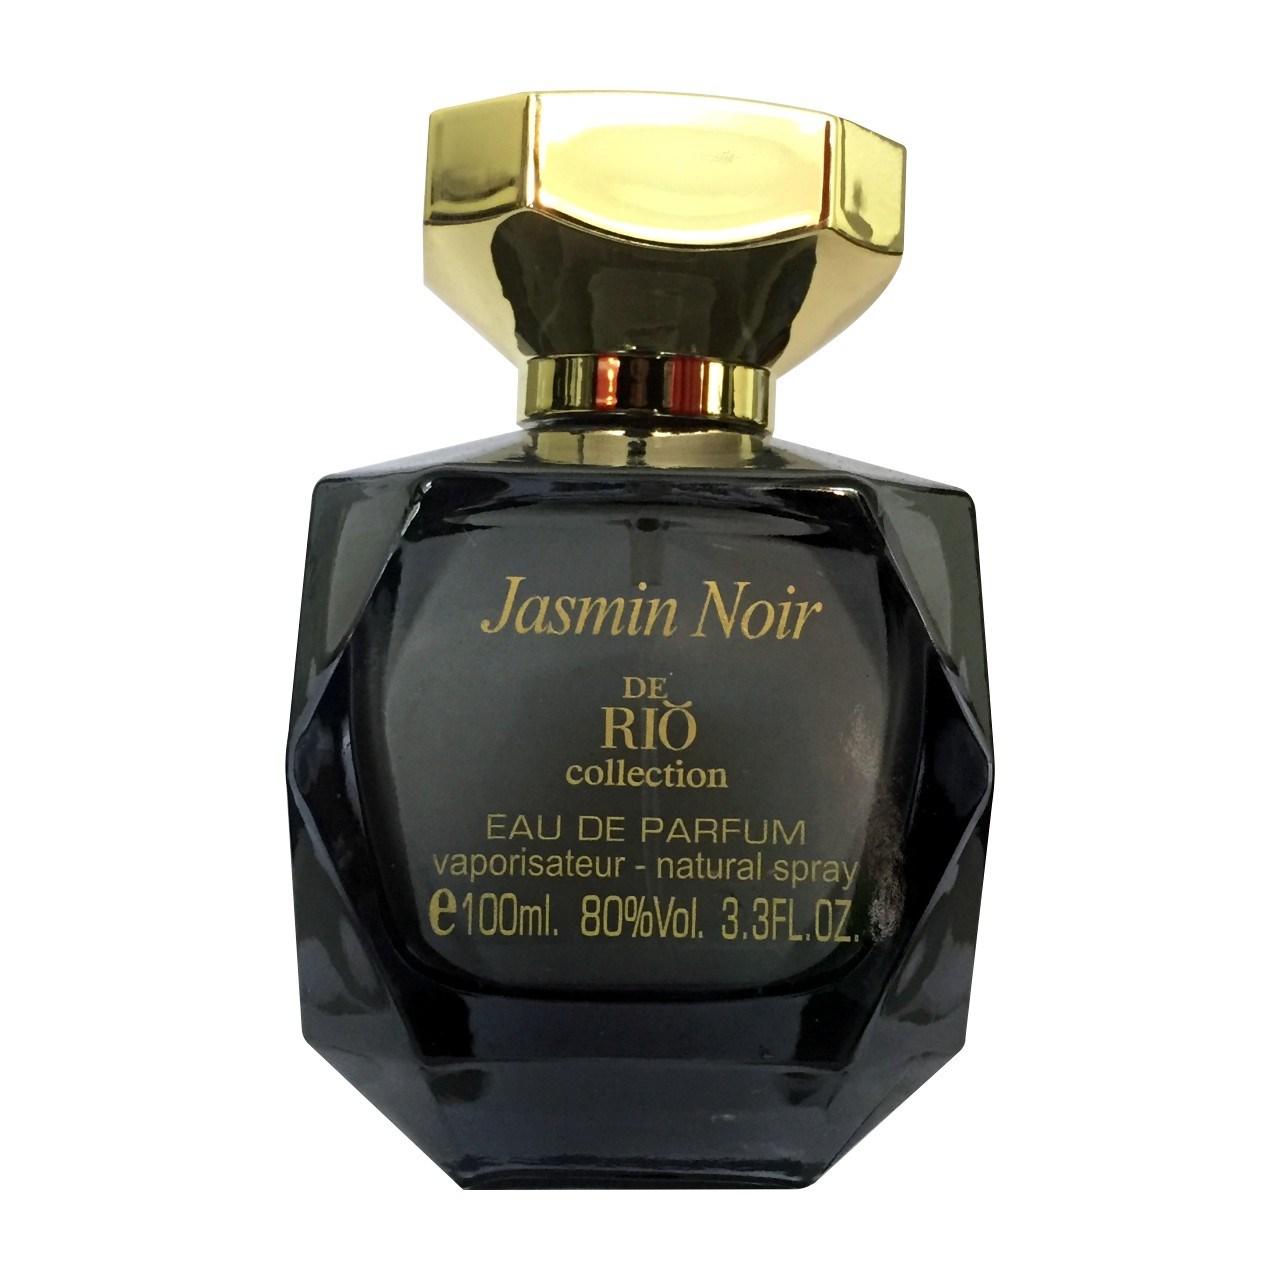 ادو پرفیوم مردانه ریو کالکشن مدل Jasmin Noir حجم 100ml